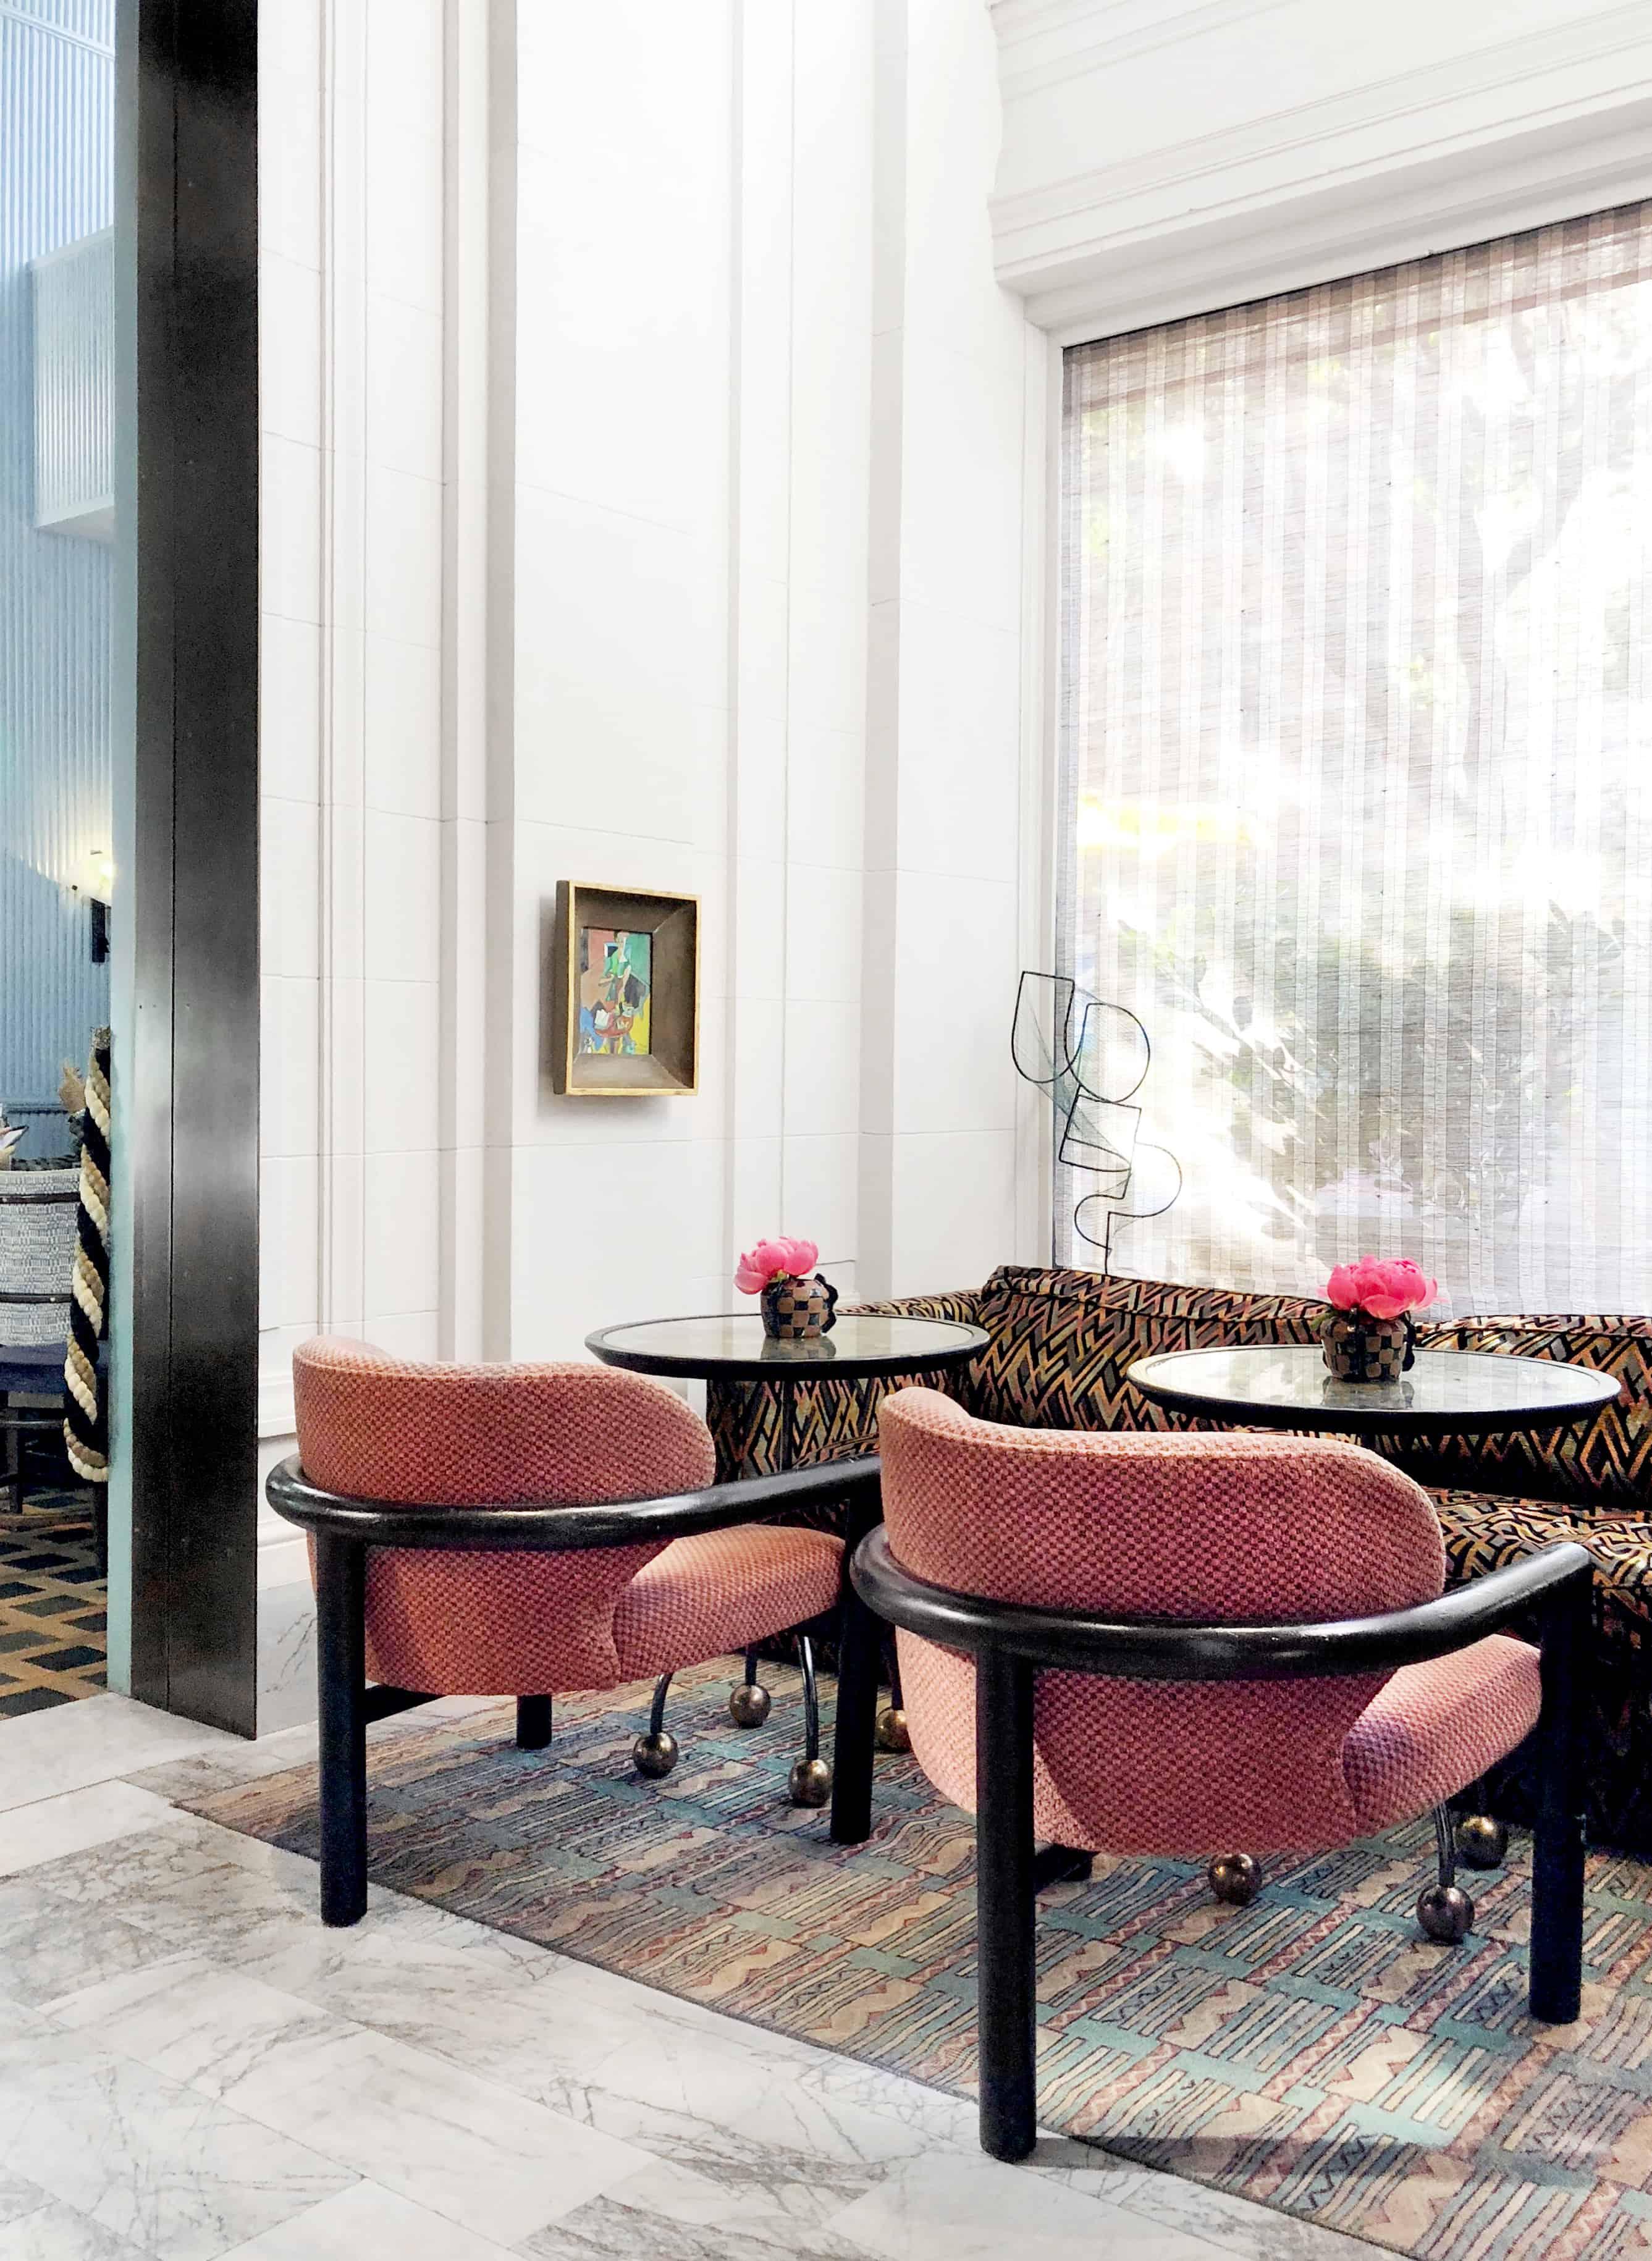 Proper Hotel San Francisco Kelly Wearstler Emily Henderson6